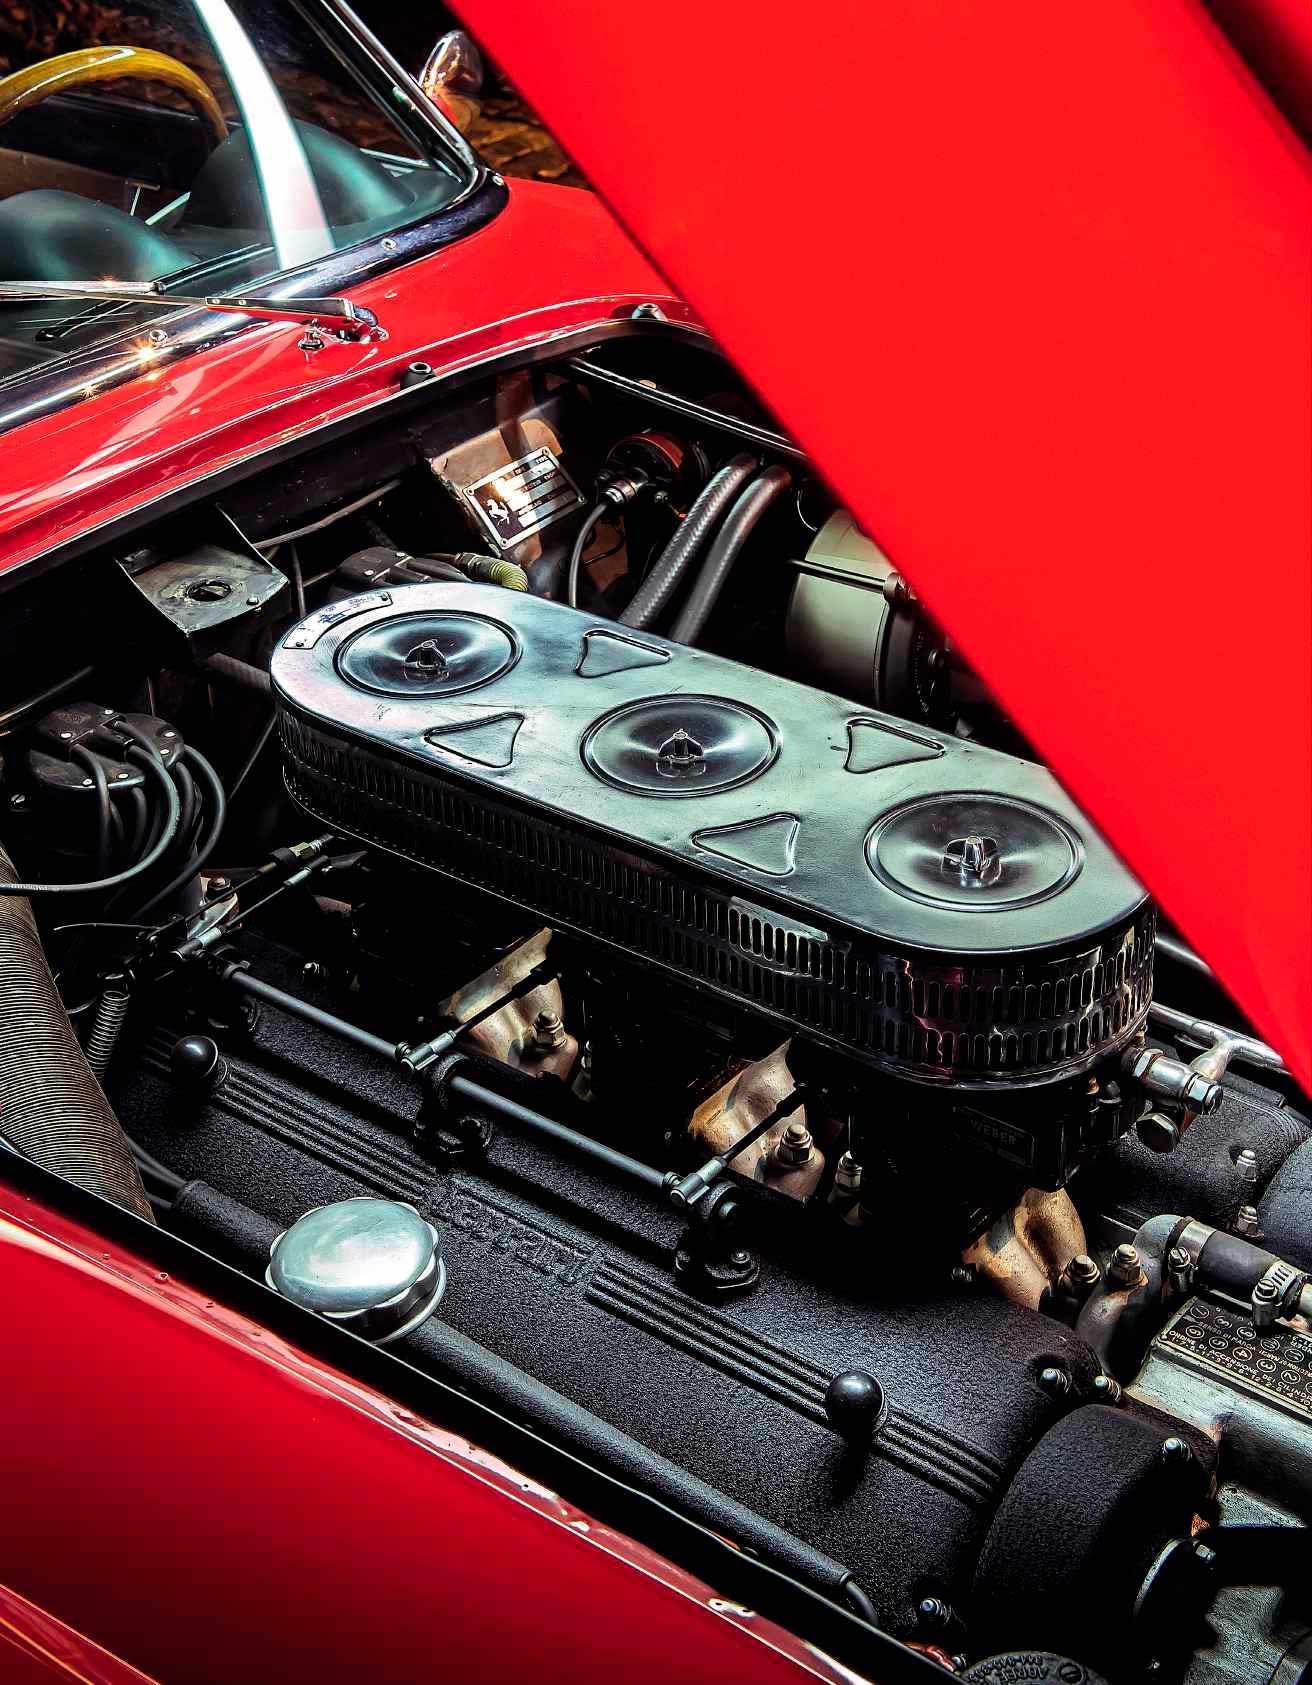 1961 Ferrari 250 GT California Spyder driven - Drive